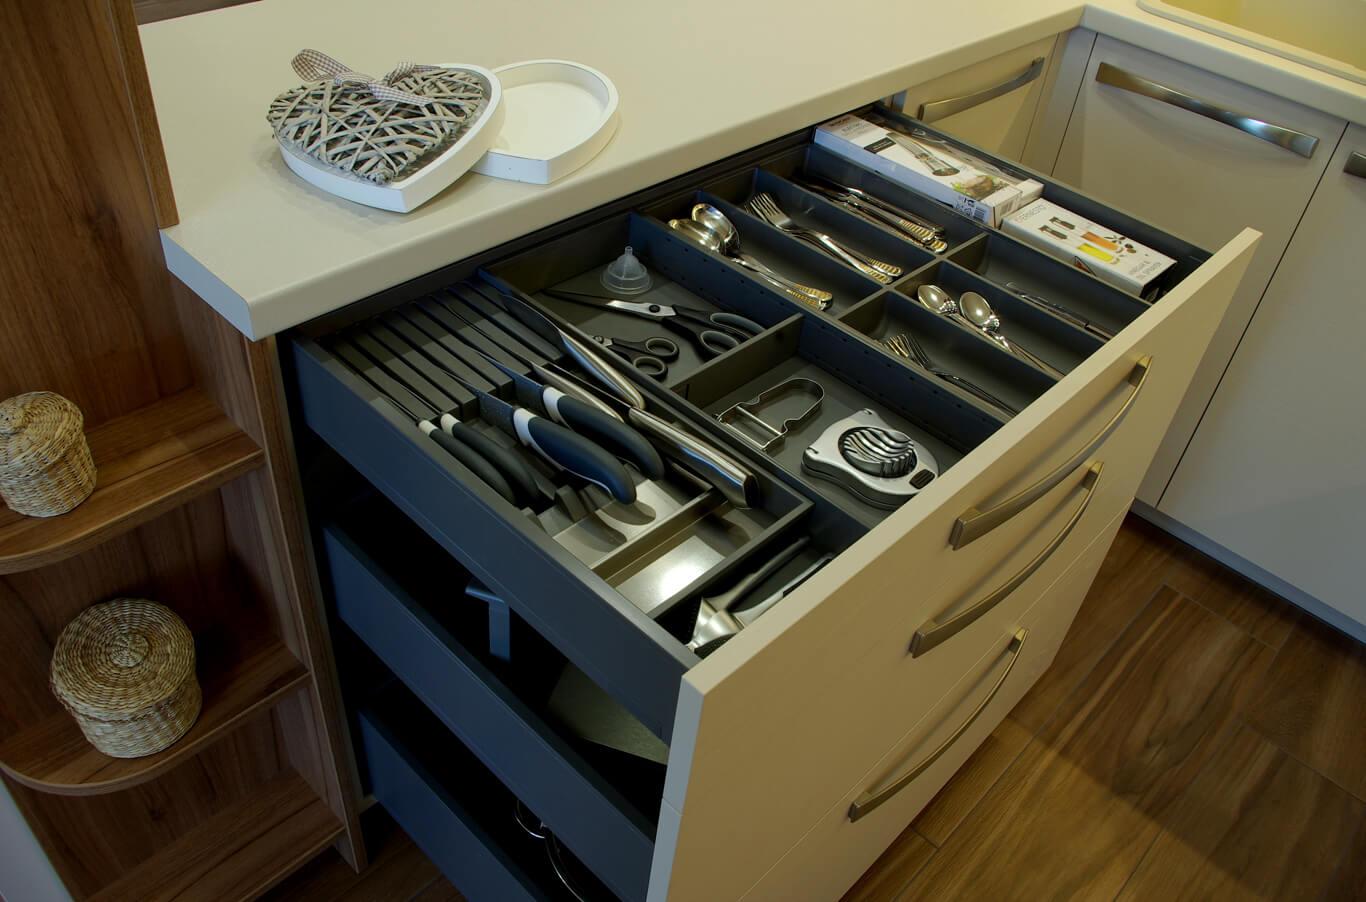 практични аксесоари за прибори и ножове